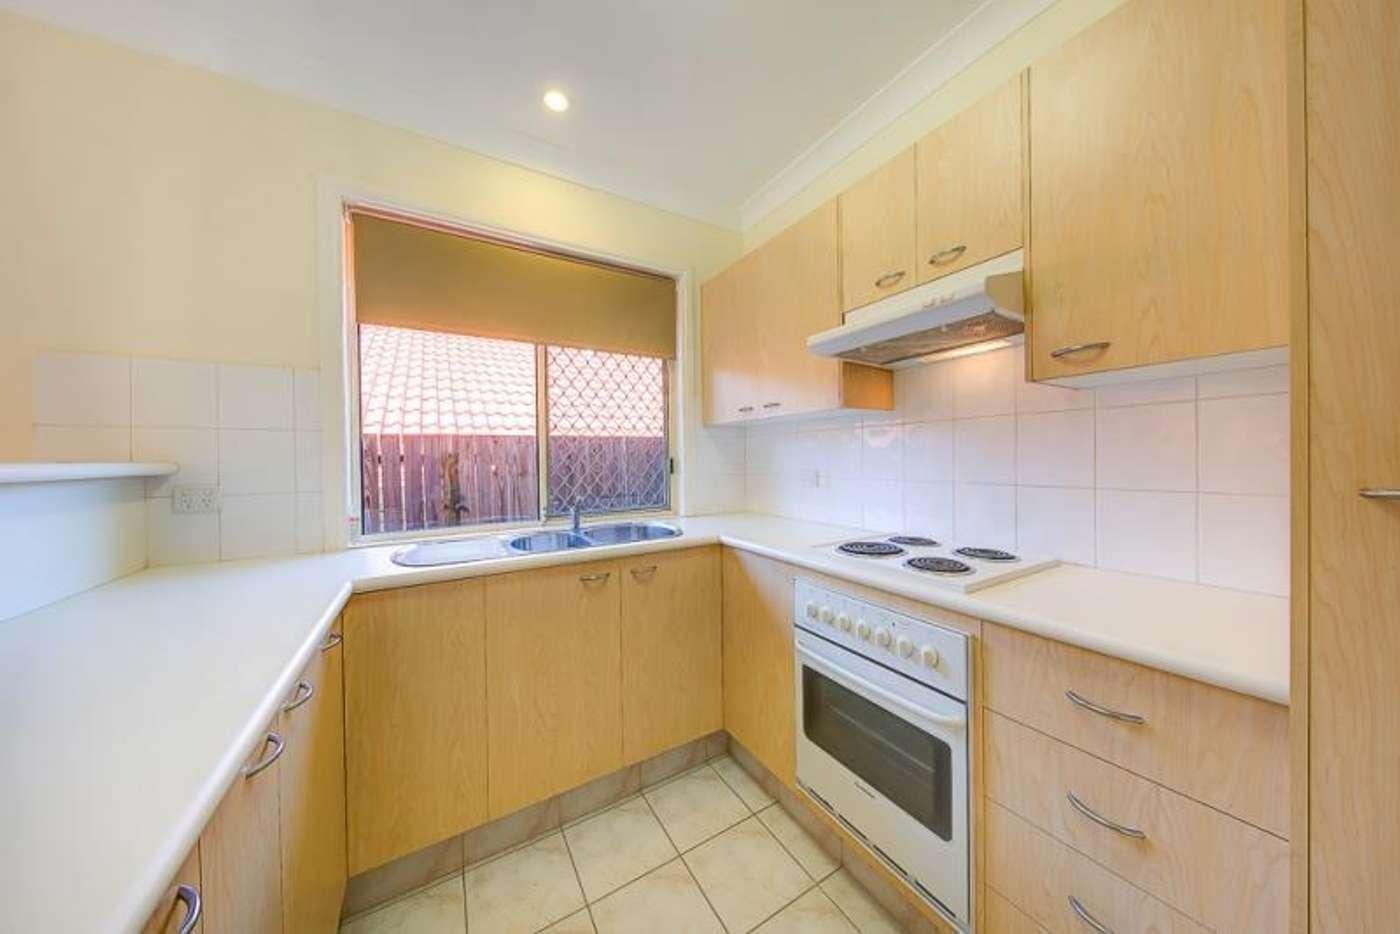 Main view of Homely villa listing, 5/30 Railton Street, Aspley QLD 4034